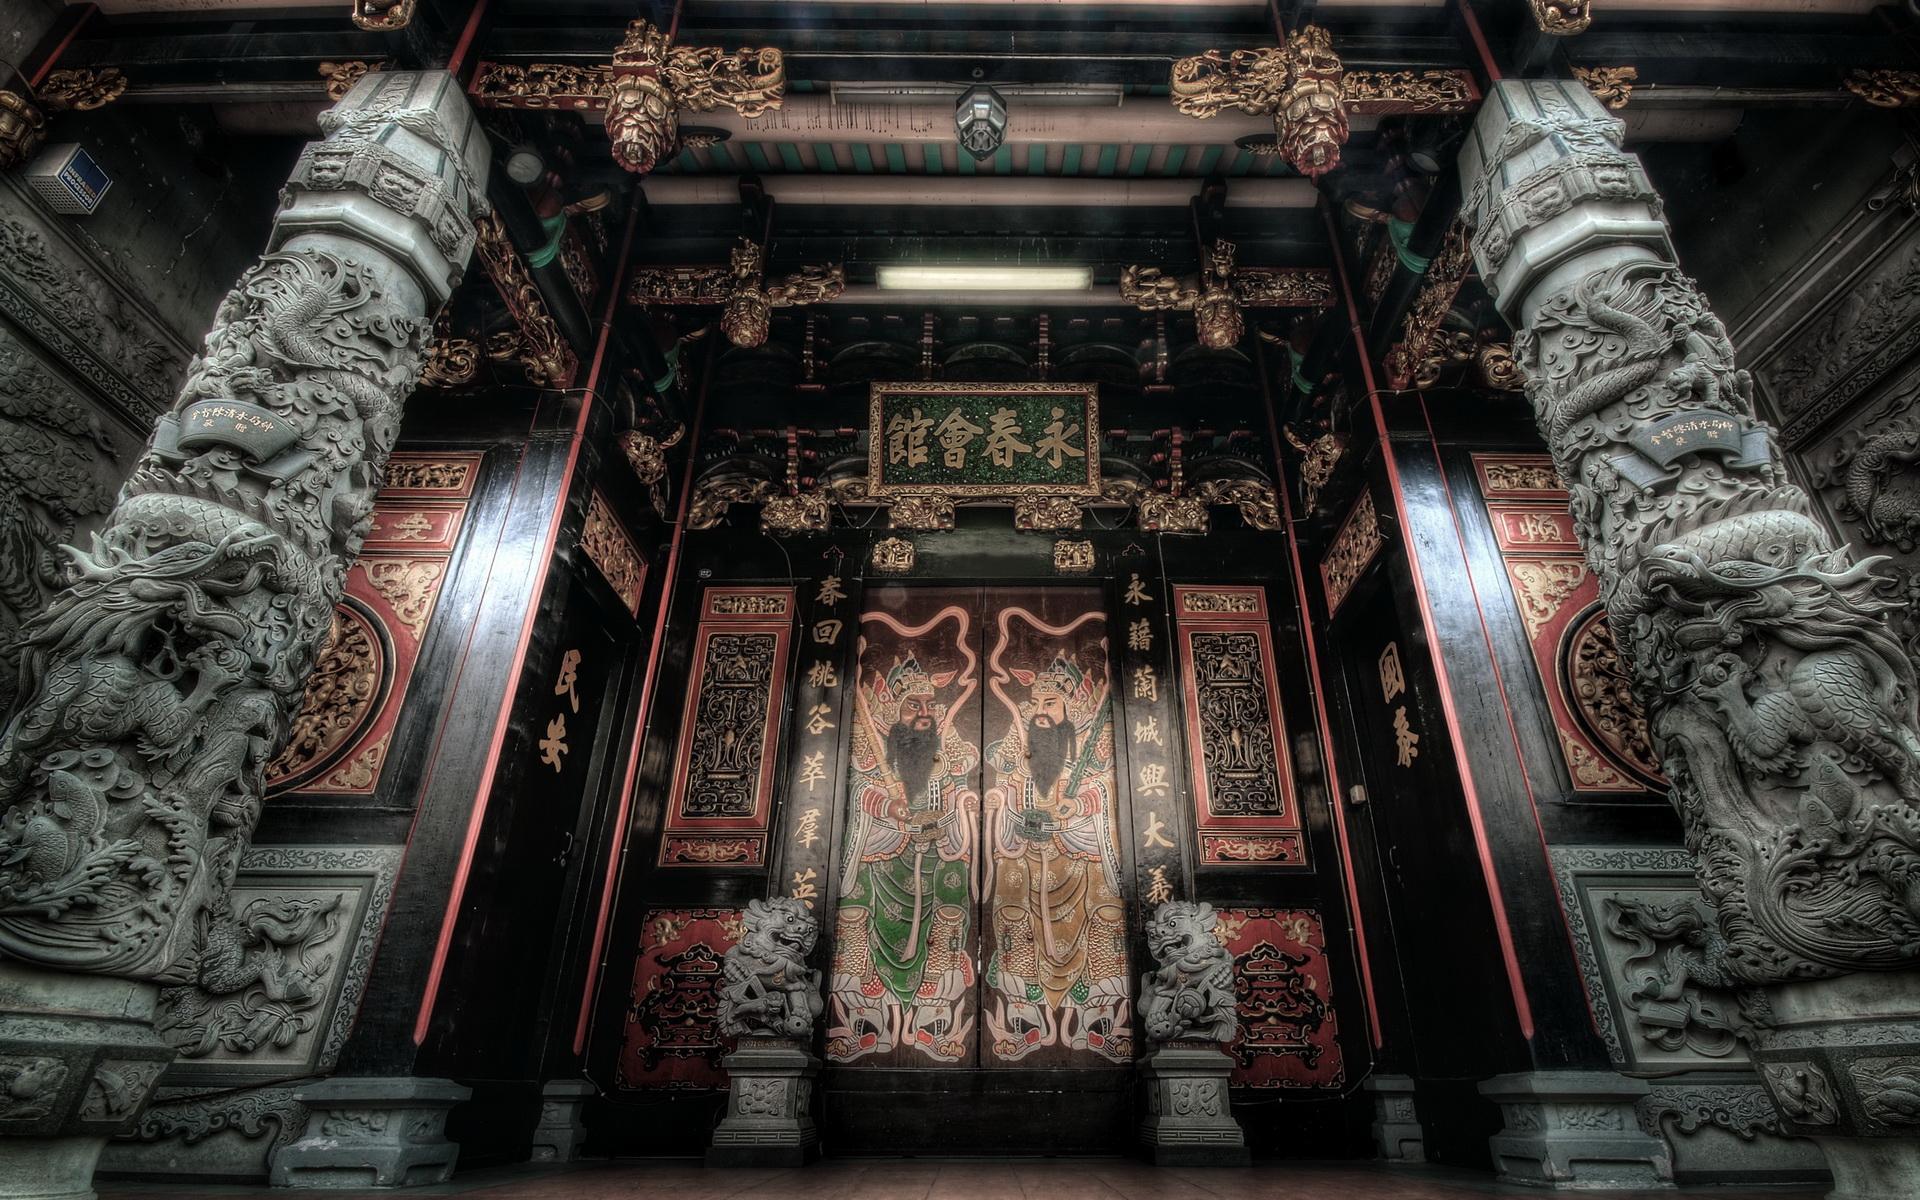 temple hd wallpaper - photo #43